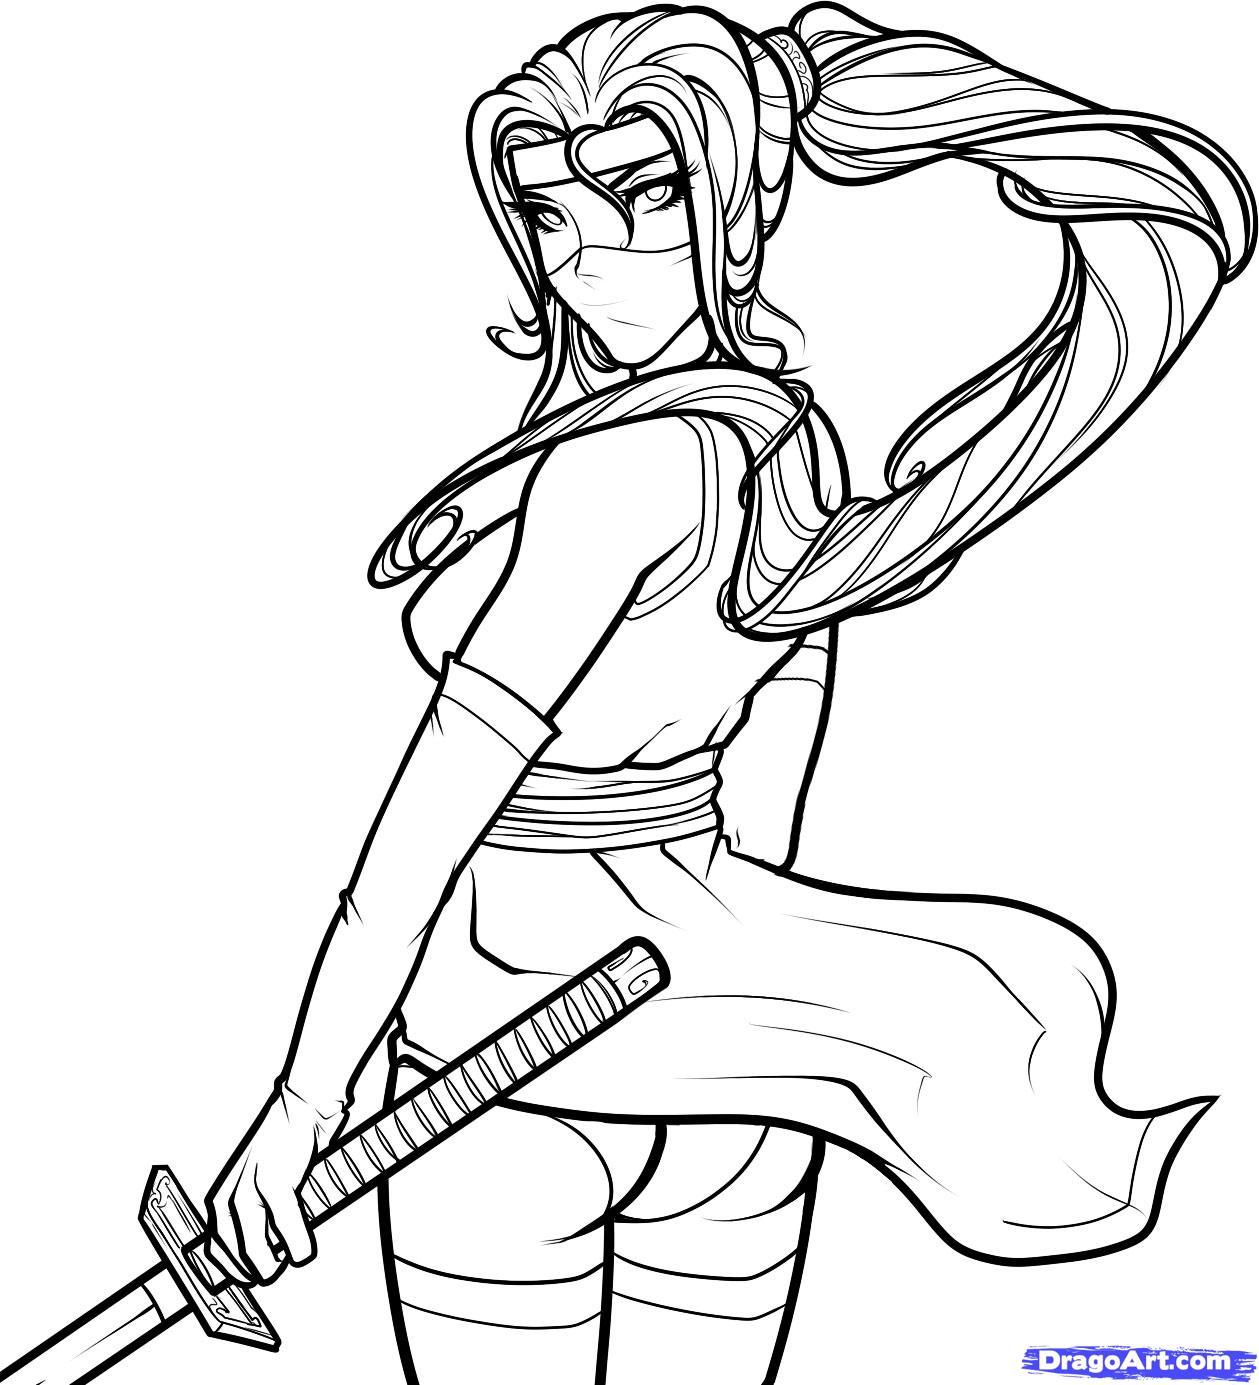 Drawing Lines In Html : Как нарисовать женщину ниндзя карандашом поэтапно